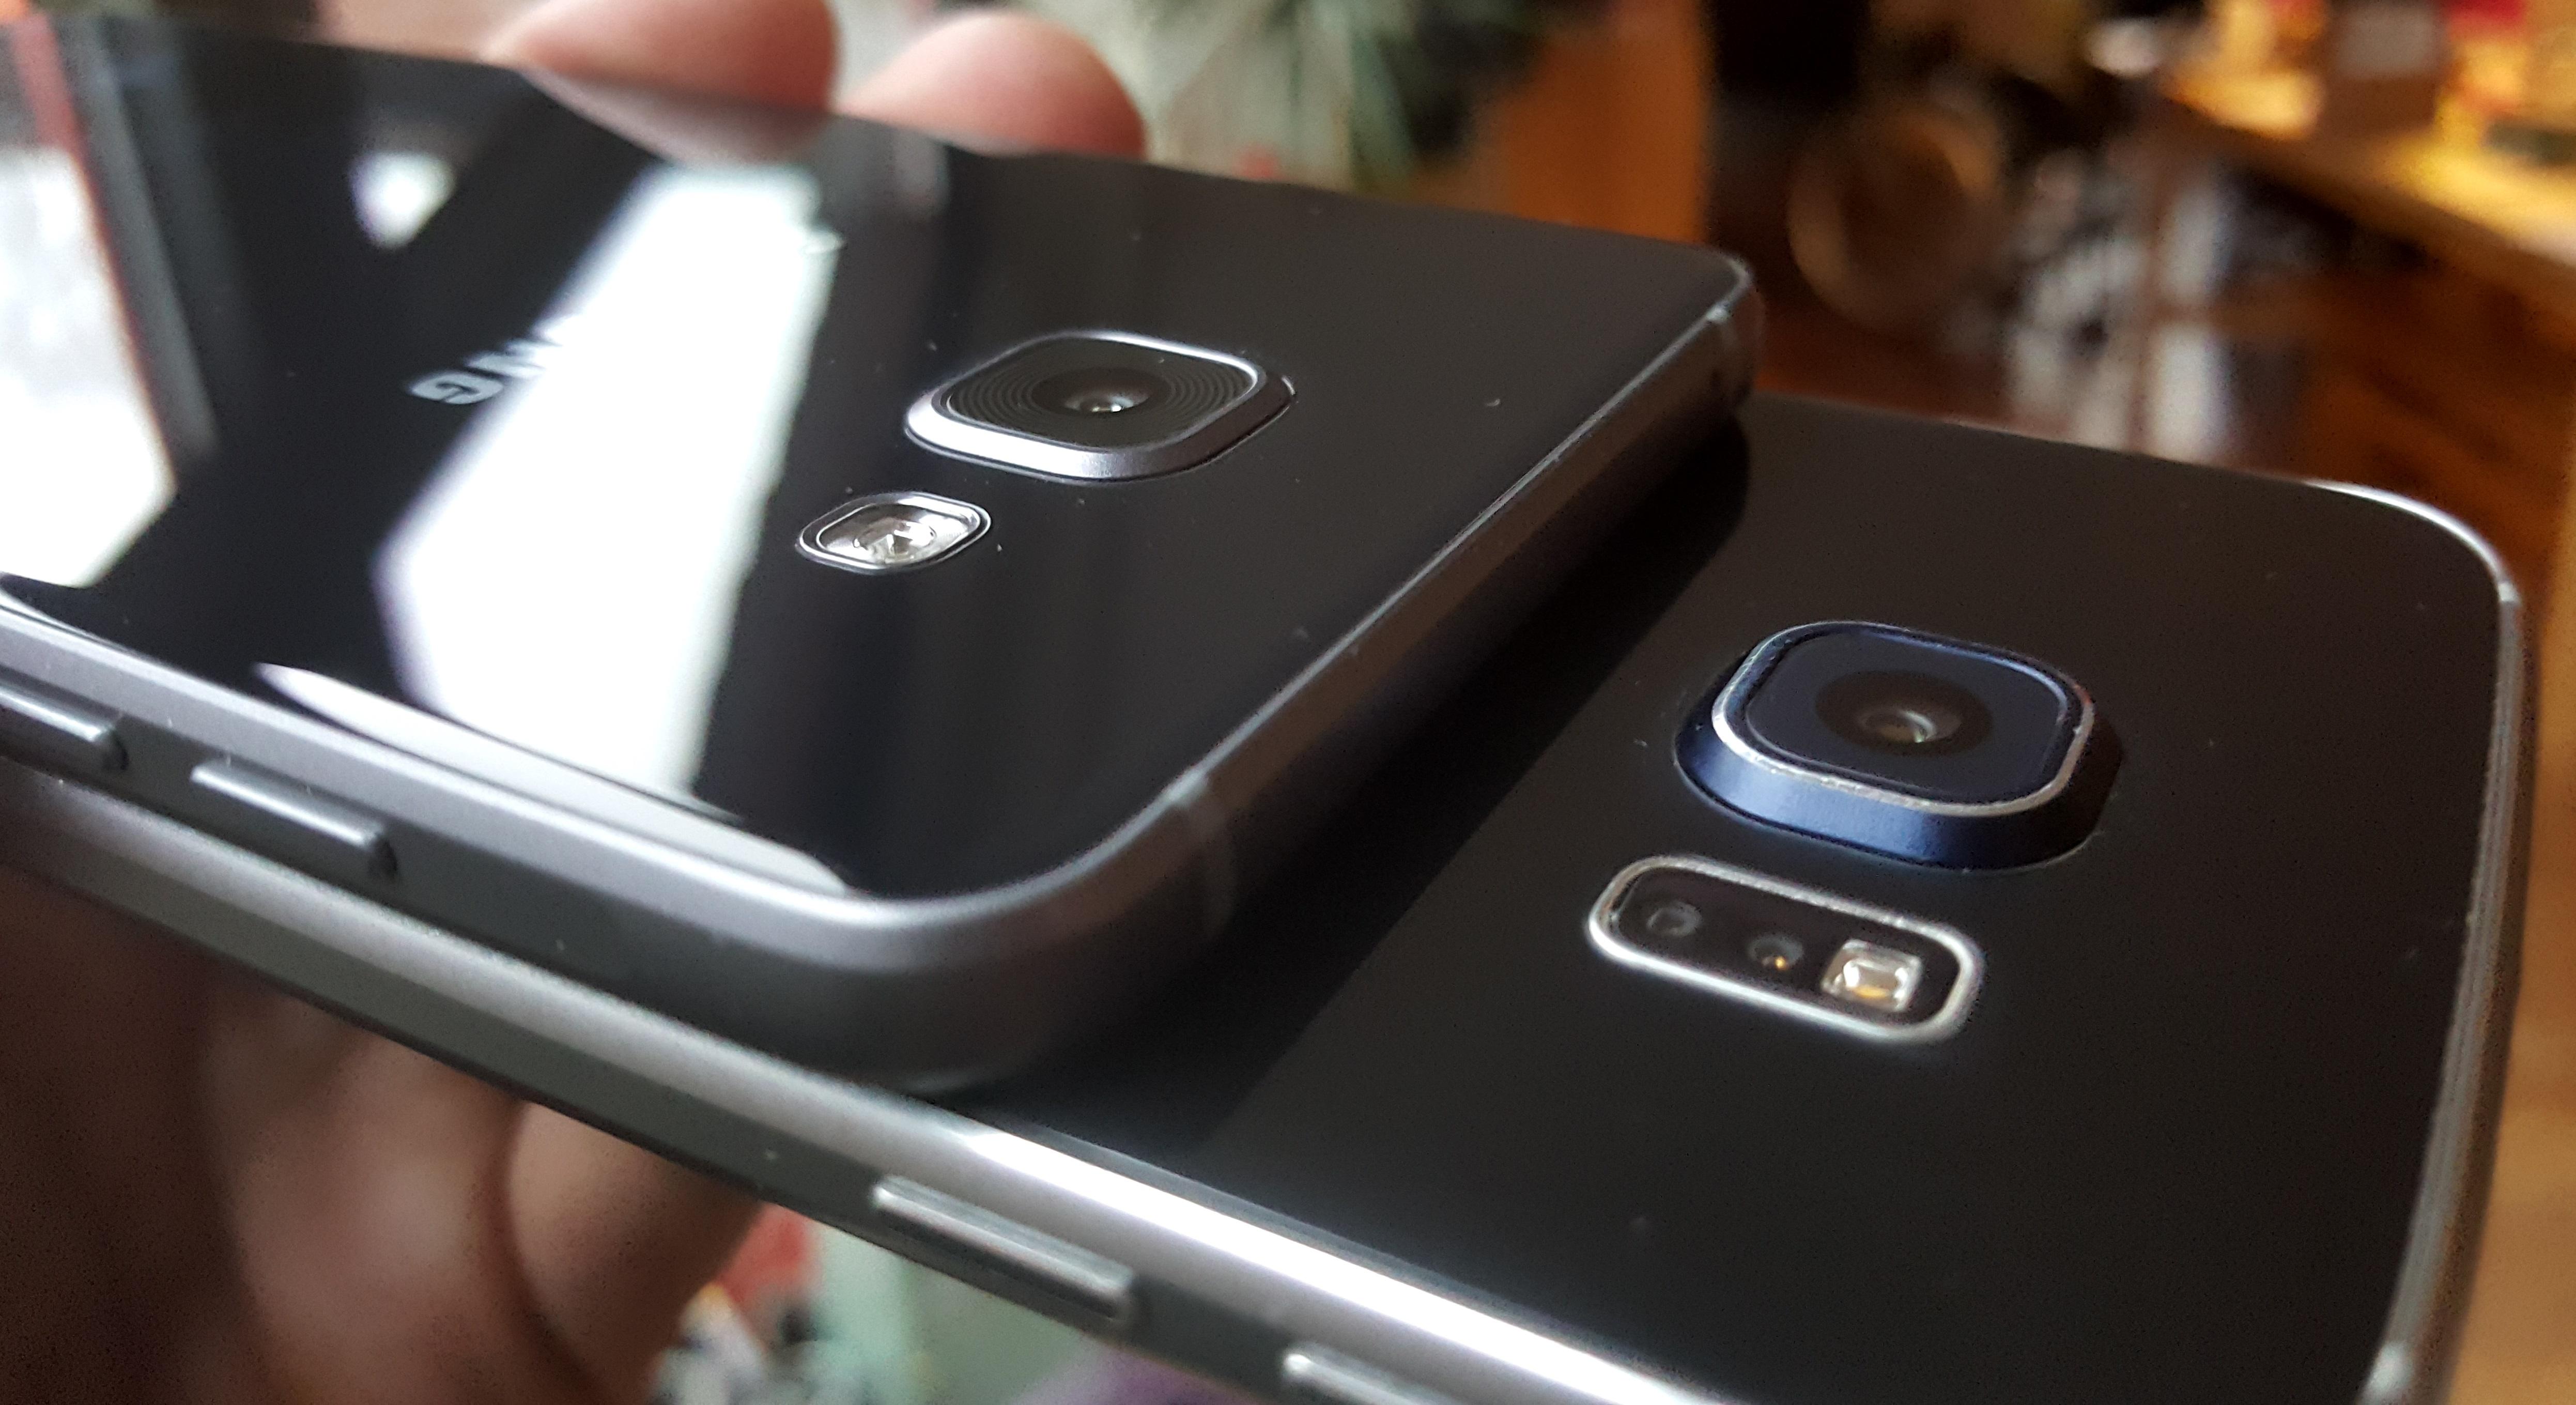 Samsung Galaxy A5 (2016) versus Galaxy S6: differences